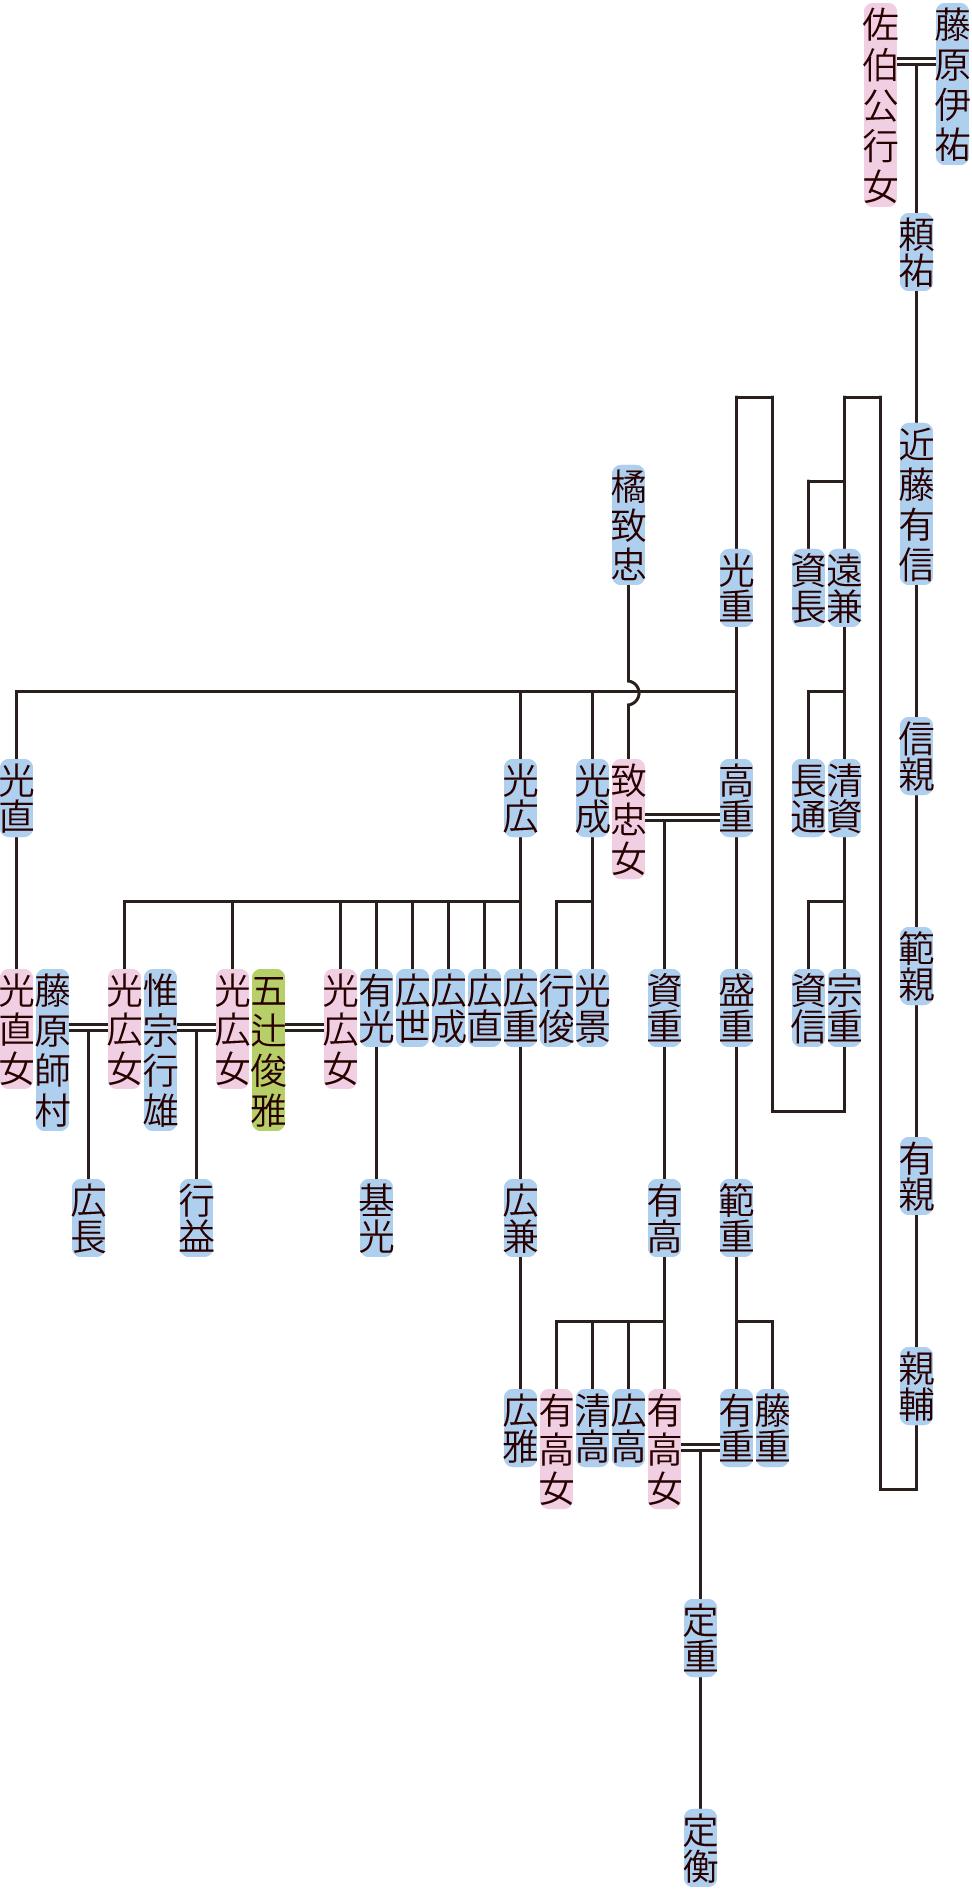 近藤有信の系図